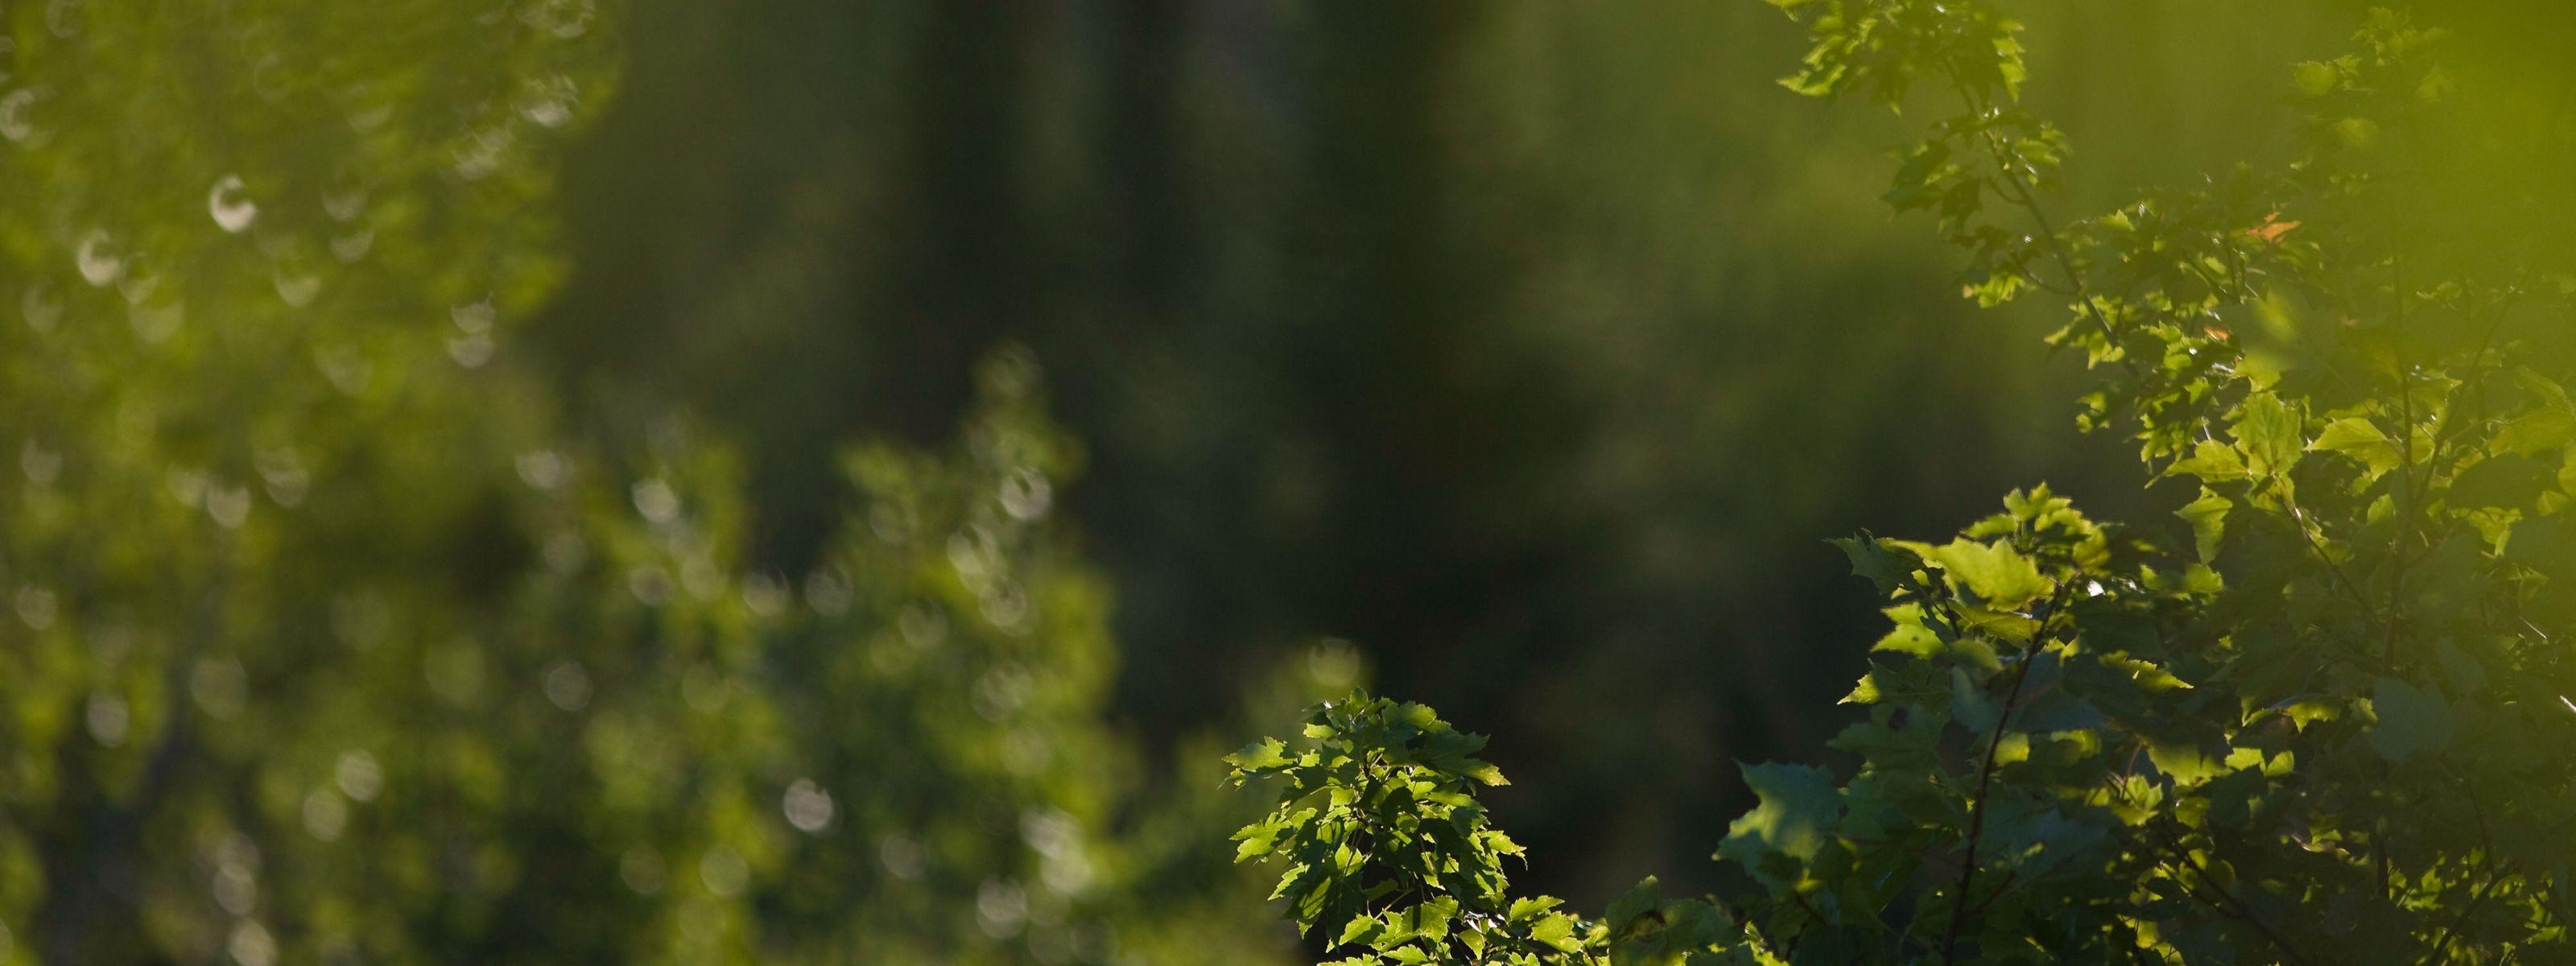 Closeup of birch bark on a tree trunk.